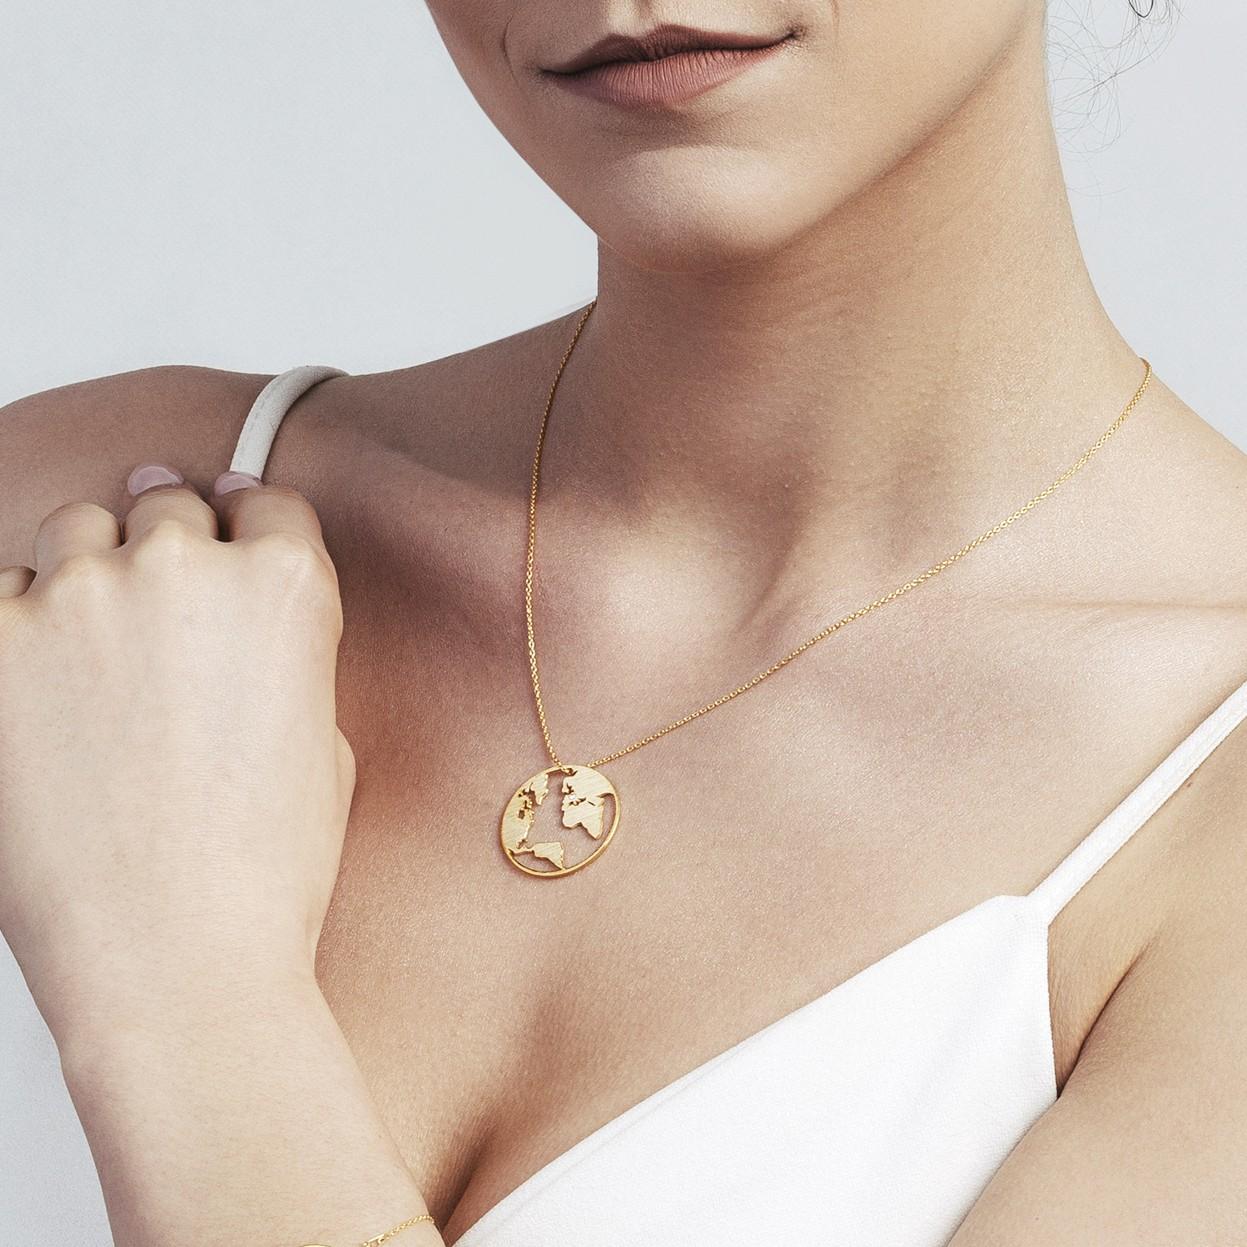 MON DÉFI Necklace - Globe, Silver 925